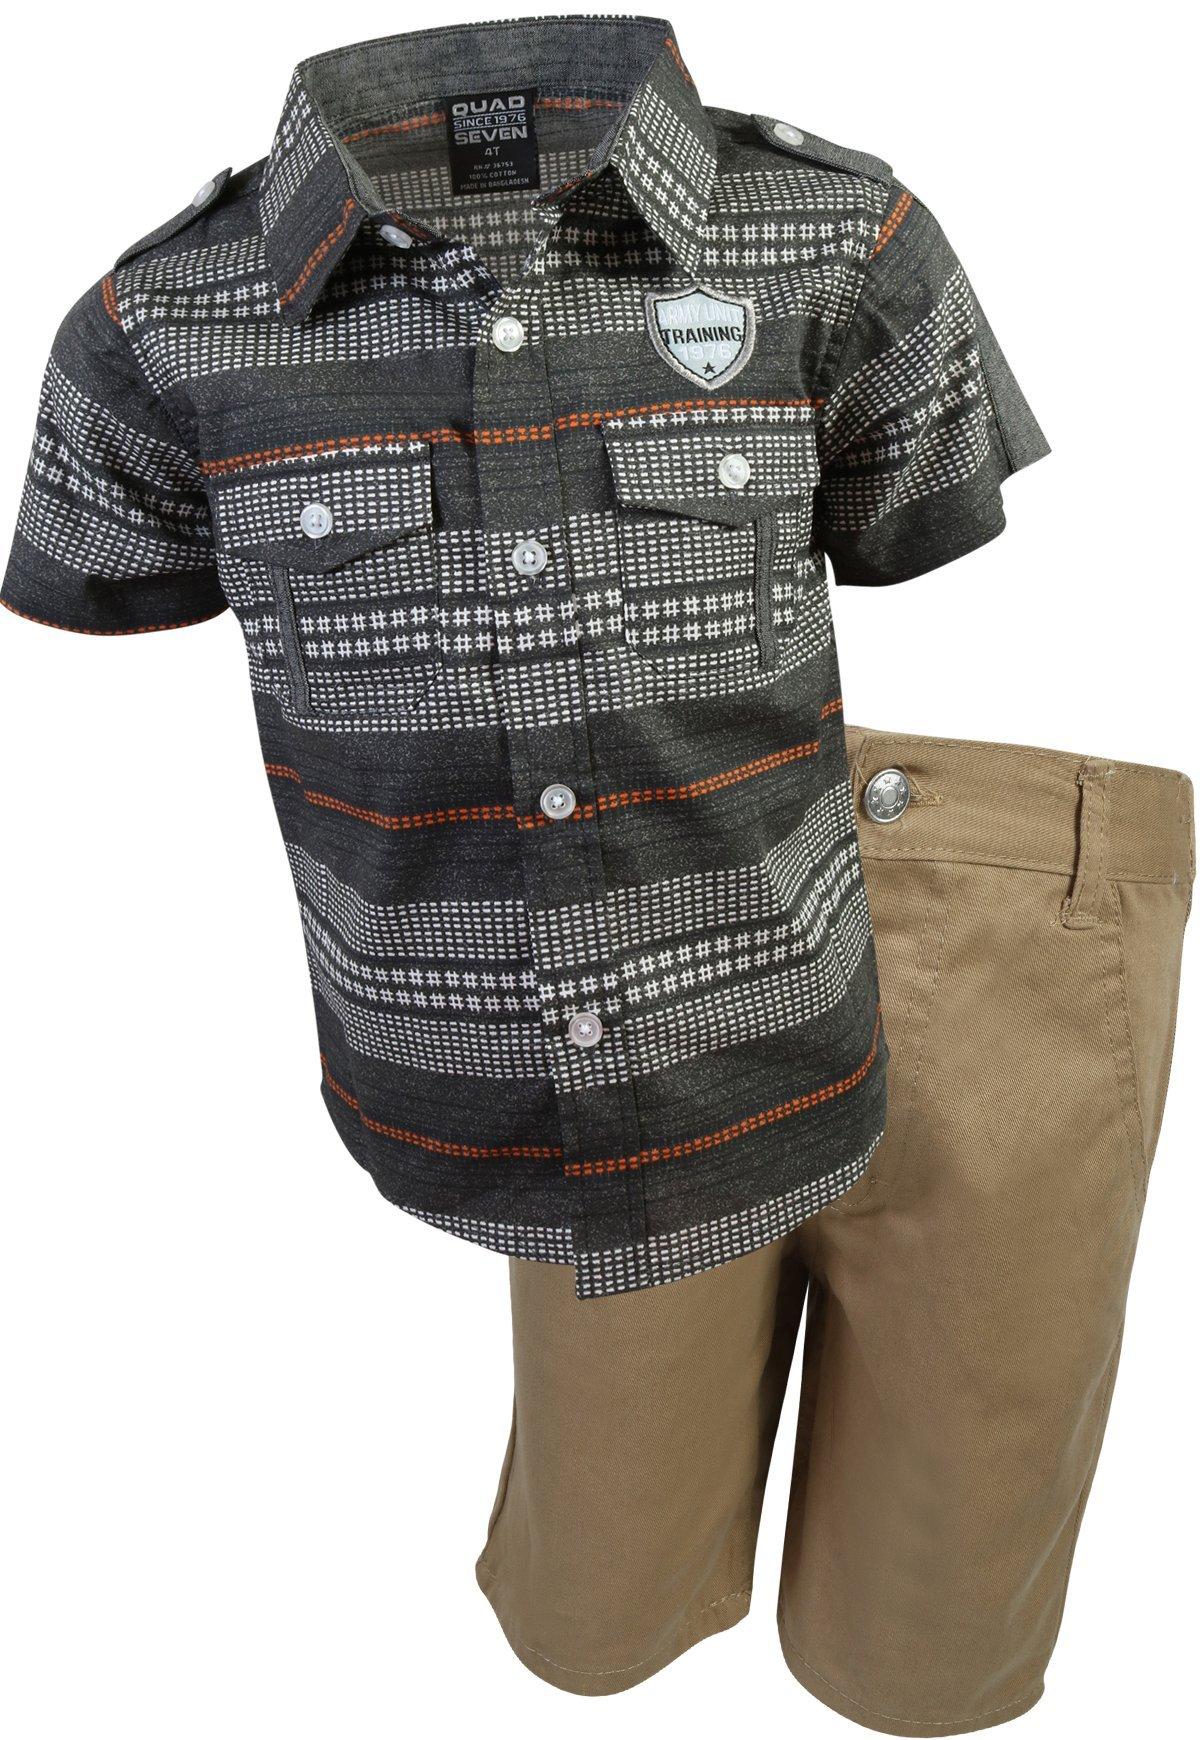 Quad Seven Boys Short Set Woven Top and Twill Shorts, Black Denim/Khaki, Size 3T'